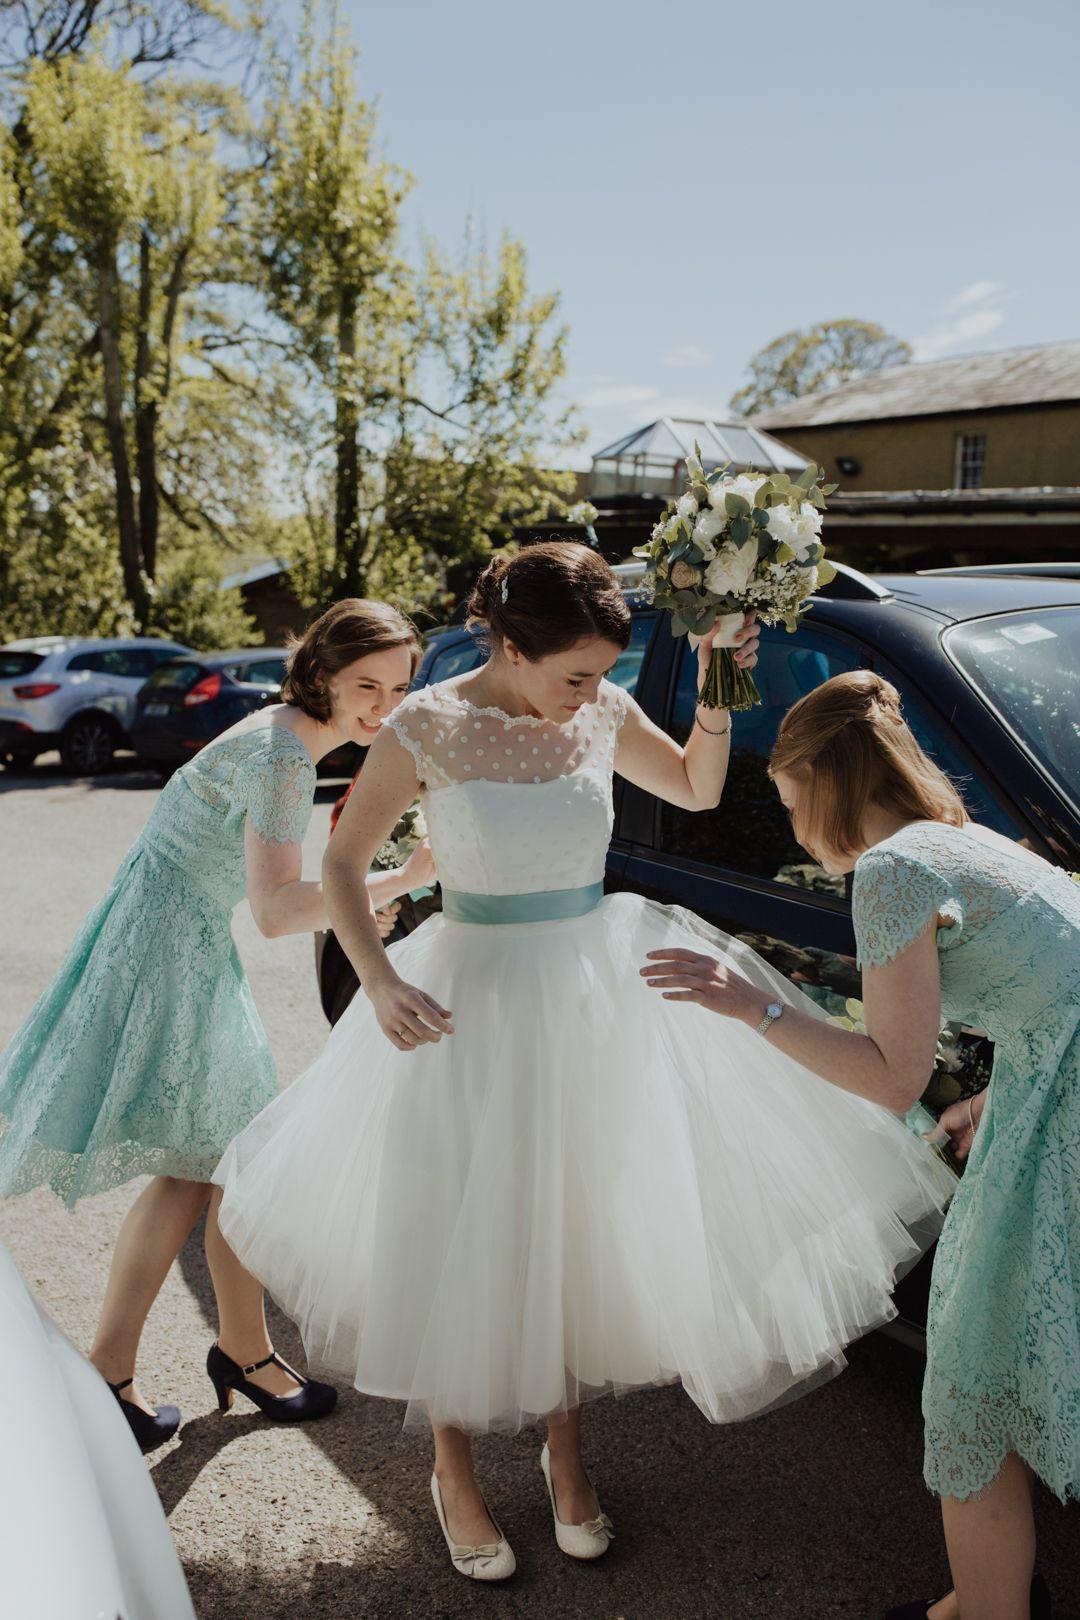 Sweet Simple And So Much Fun Olivia Donnacha Onefabday Com Short Wedding Dress Vintage Tea Length Wedding Dress Short Wedding Dress [ 1620 x 1080 Pixel ]